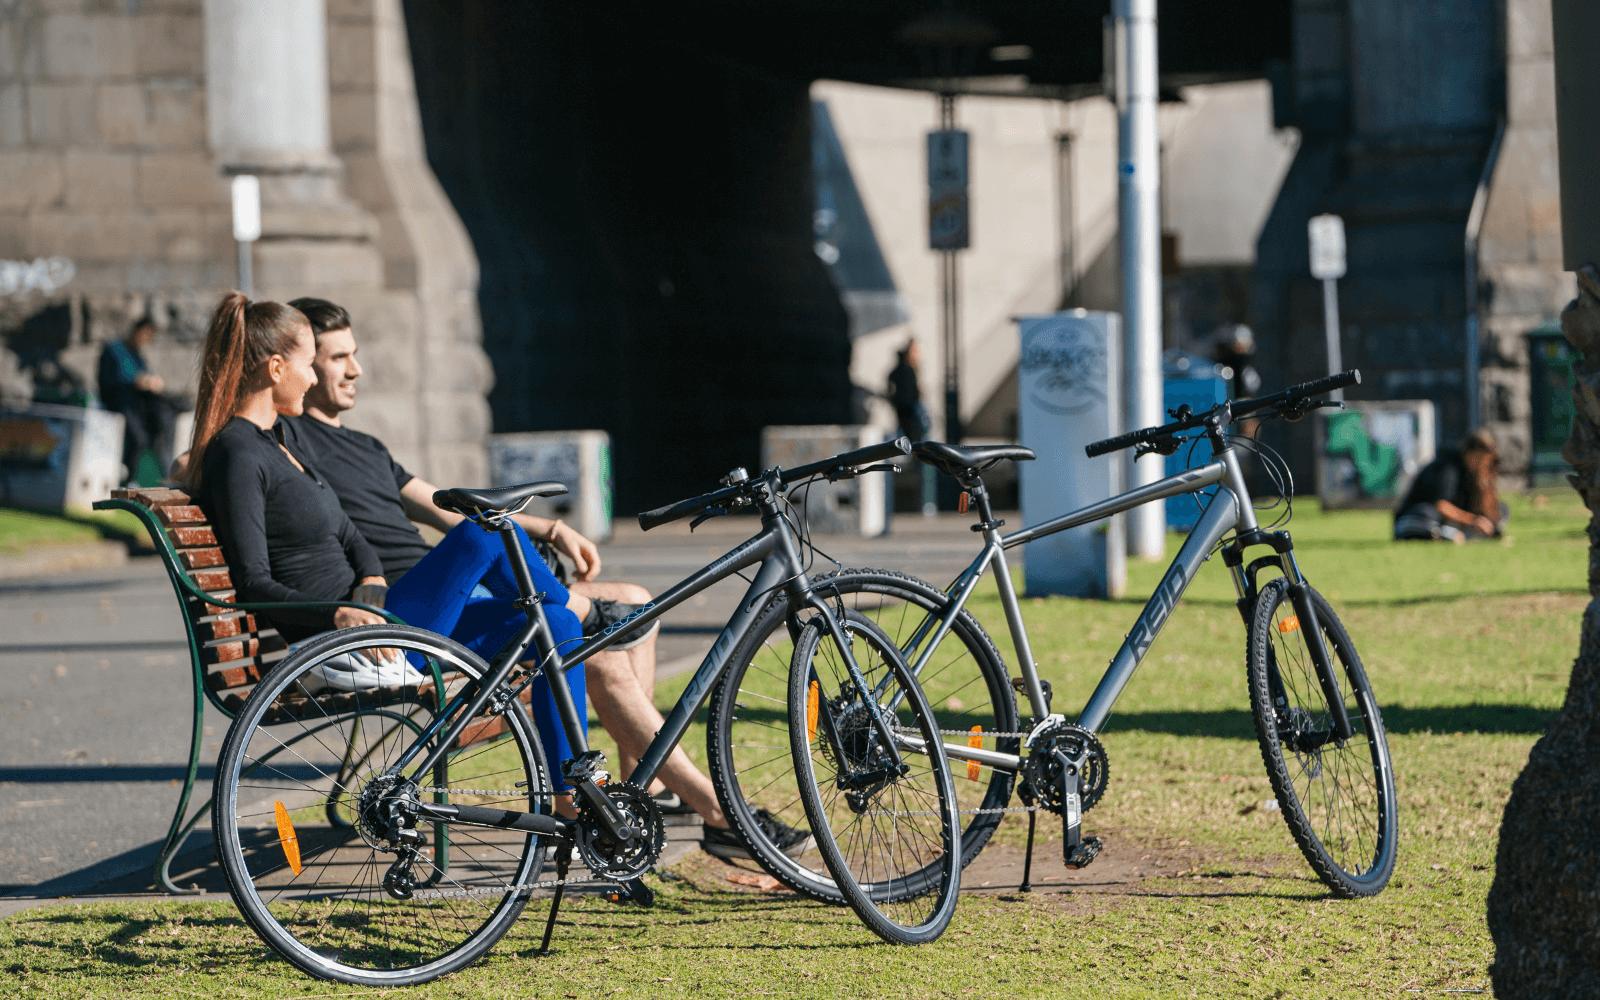 Copy of Copy of Lifestyle images 32 1 - Reid ® - City 3 Bike